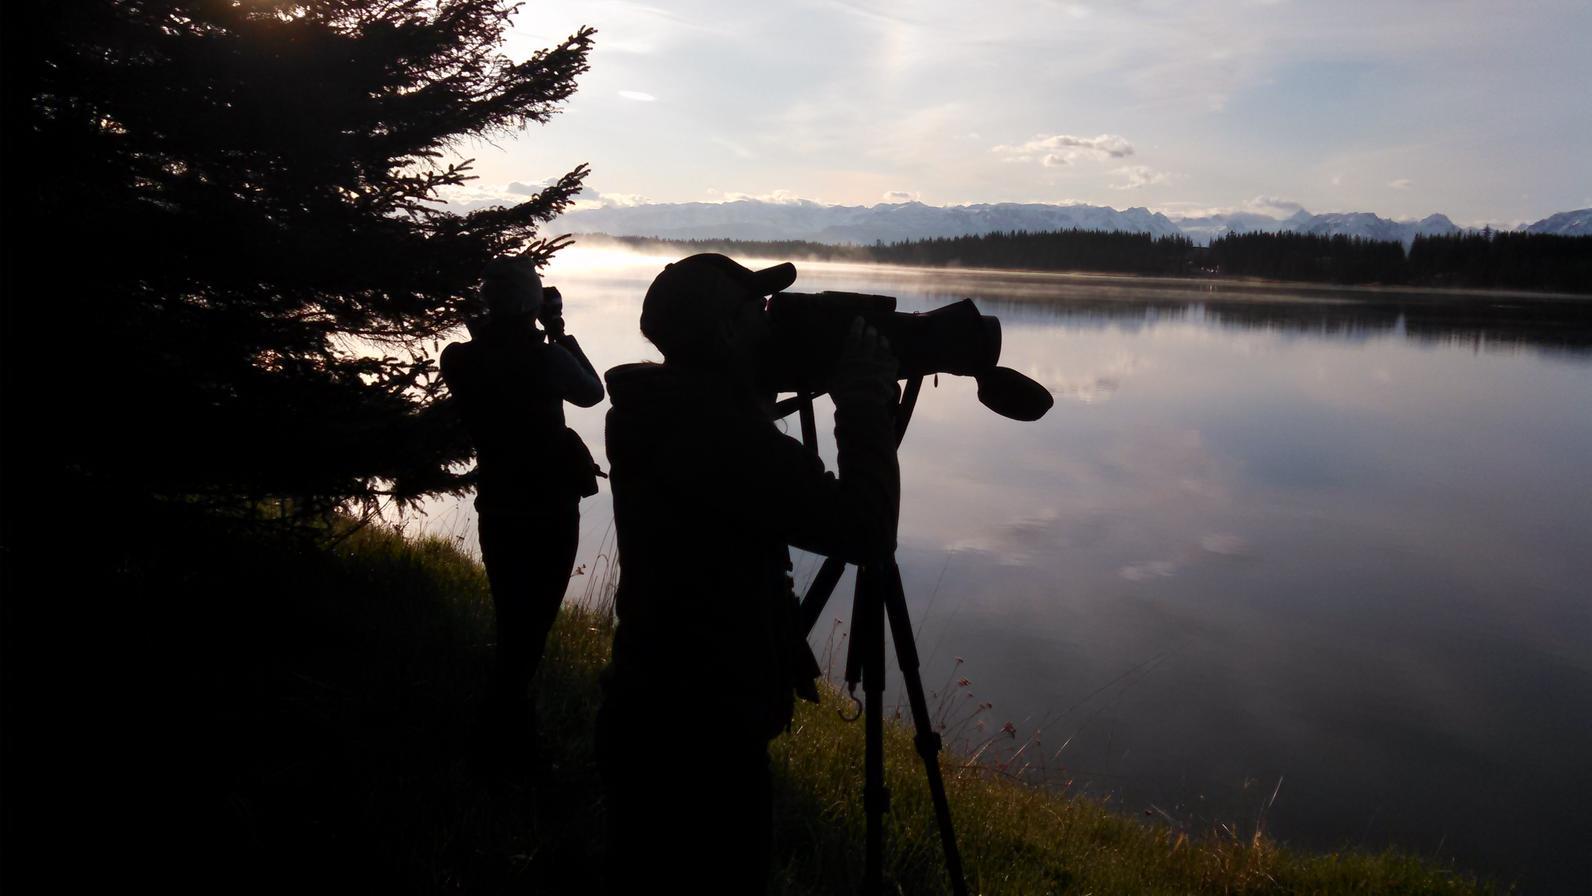 You can go birding while still maintaining social distance.